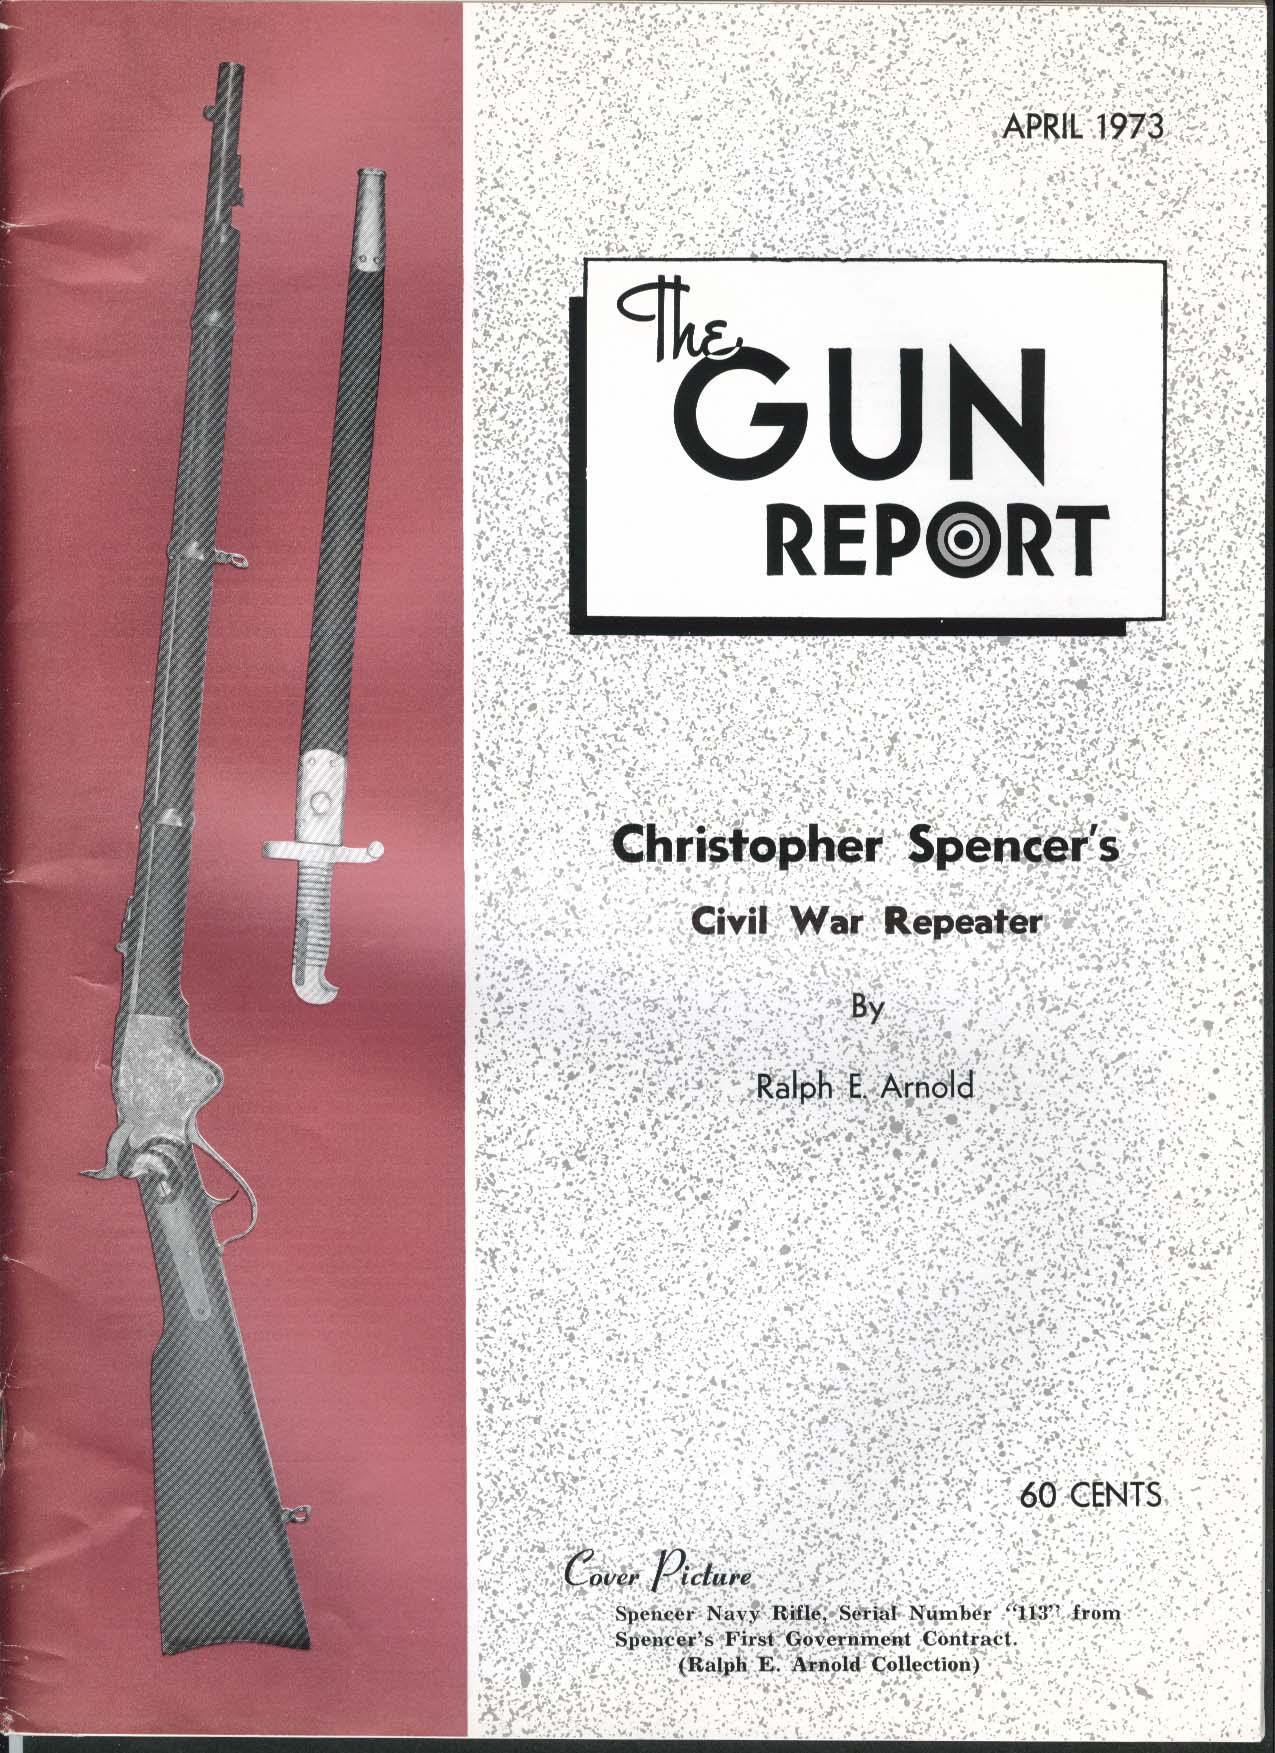 GUN REPORT Christopher Spencer Civil War Navy Repeater 4 1973